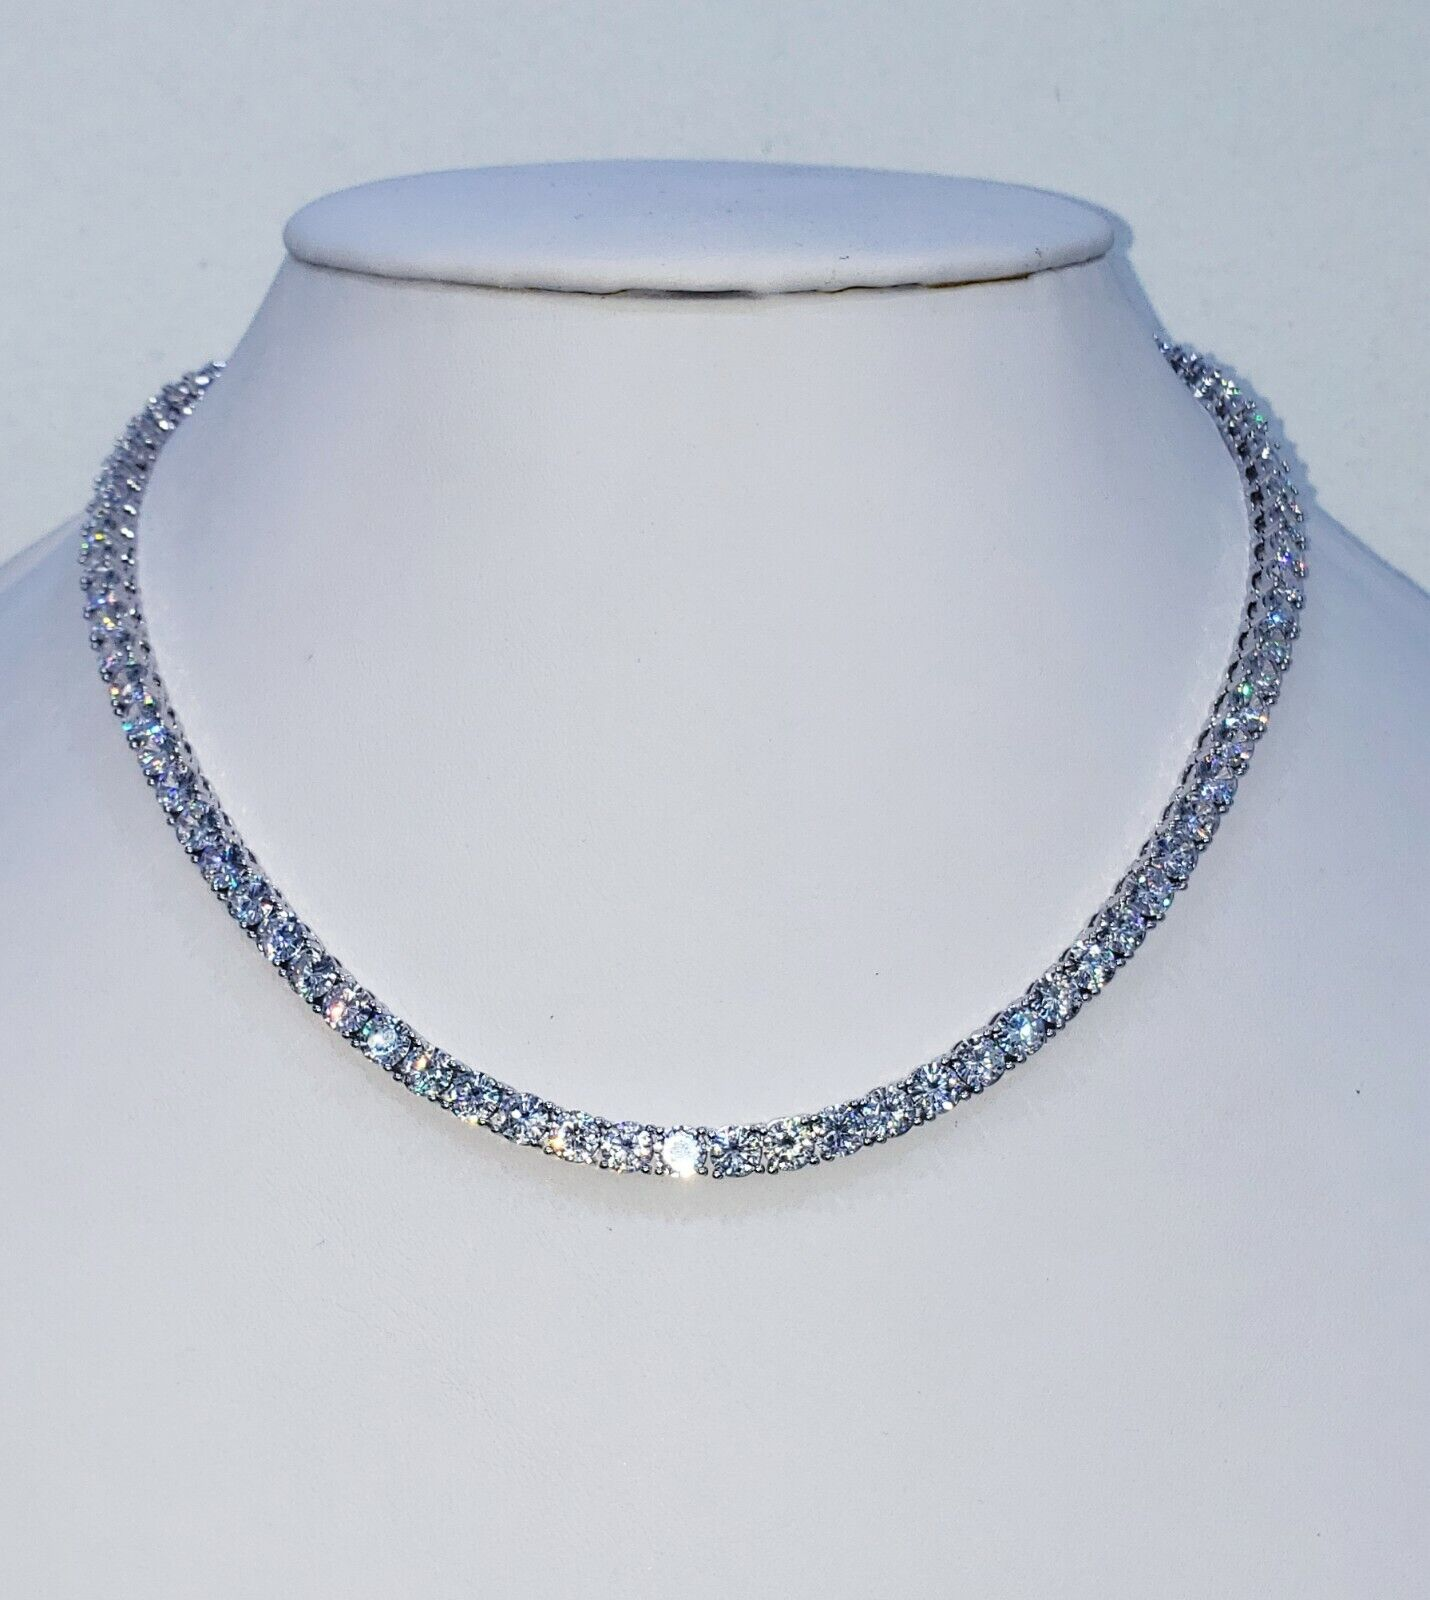 5 MM DIAMOND TENNIS CHAIN VVS1 CRYSTALS BEST QUALITY 14 KT W